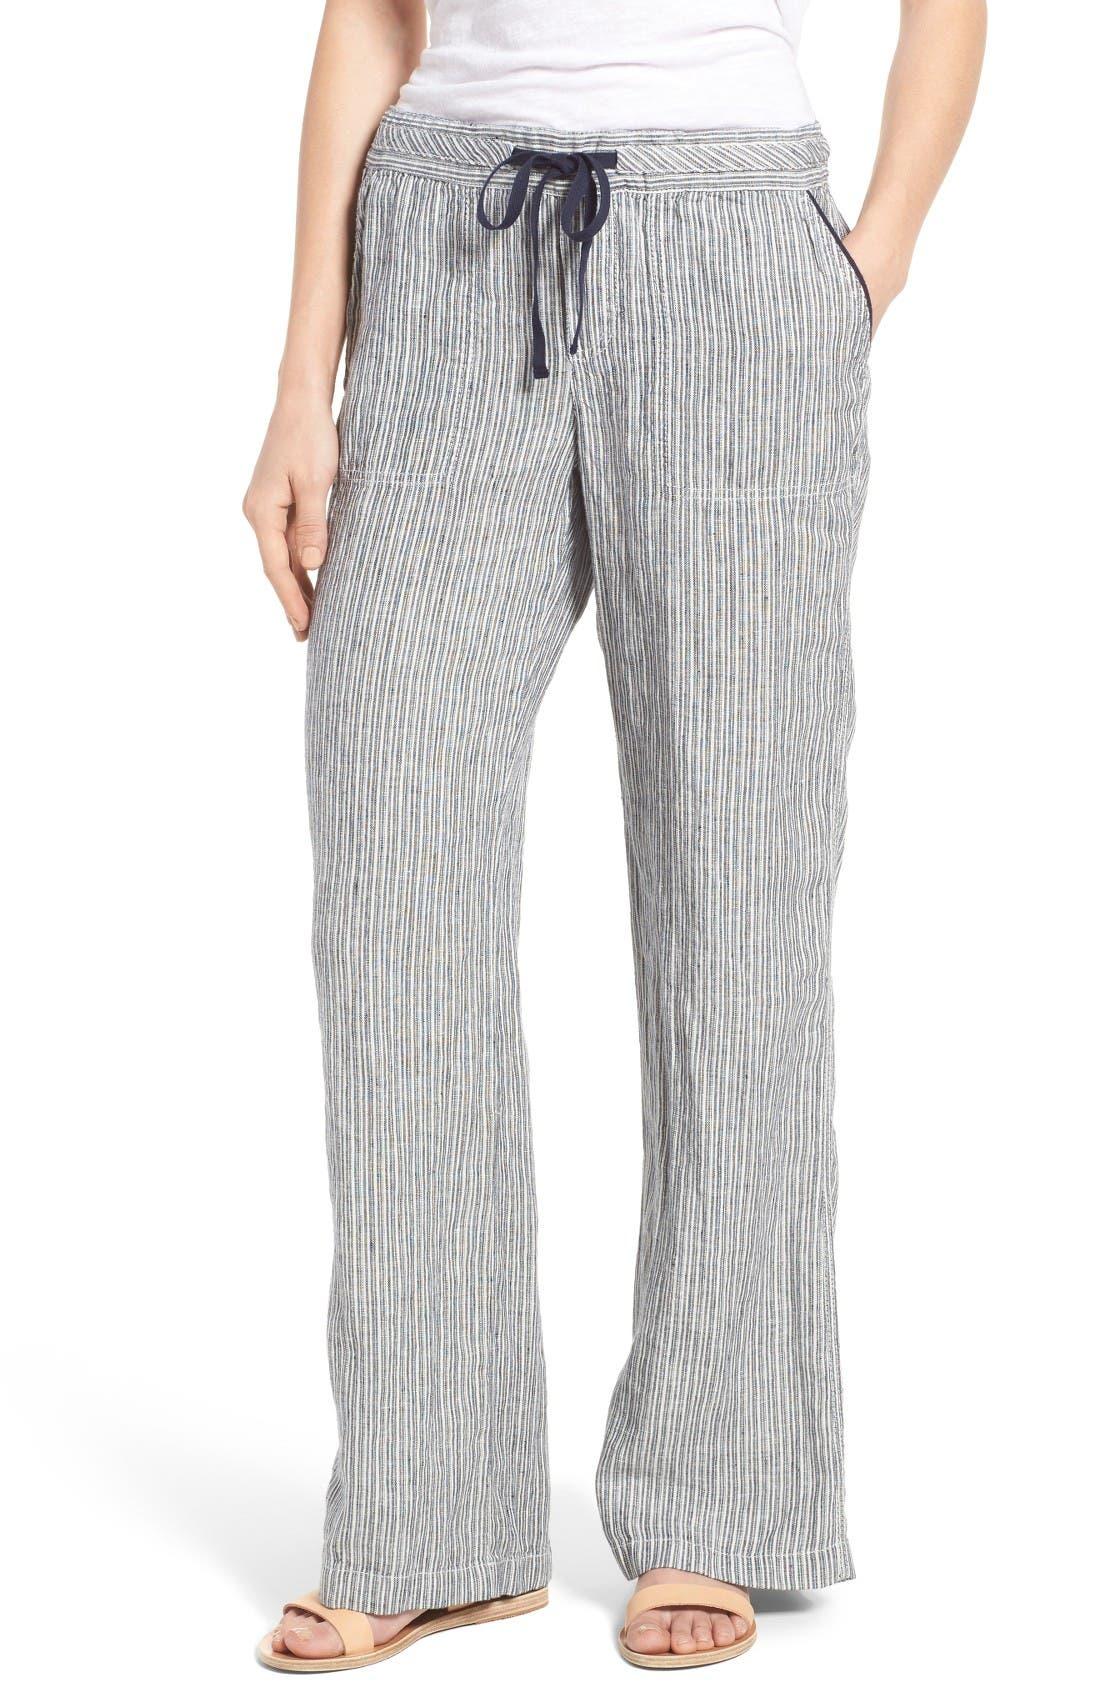 Drawstring Linen Pants,                         Main,                         color, Ivory- Navy Seaside Stripe